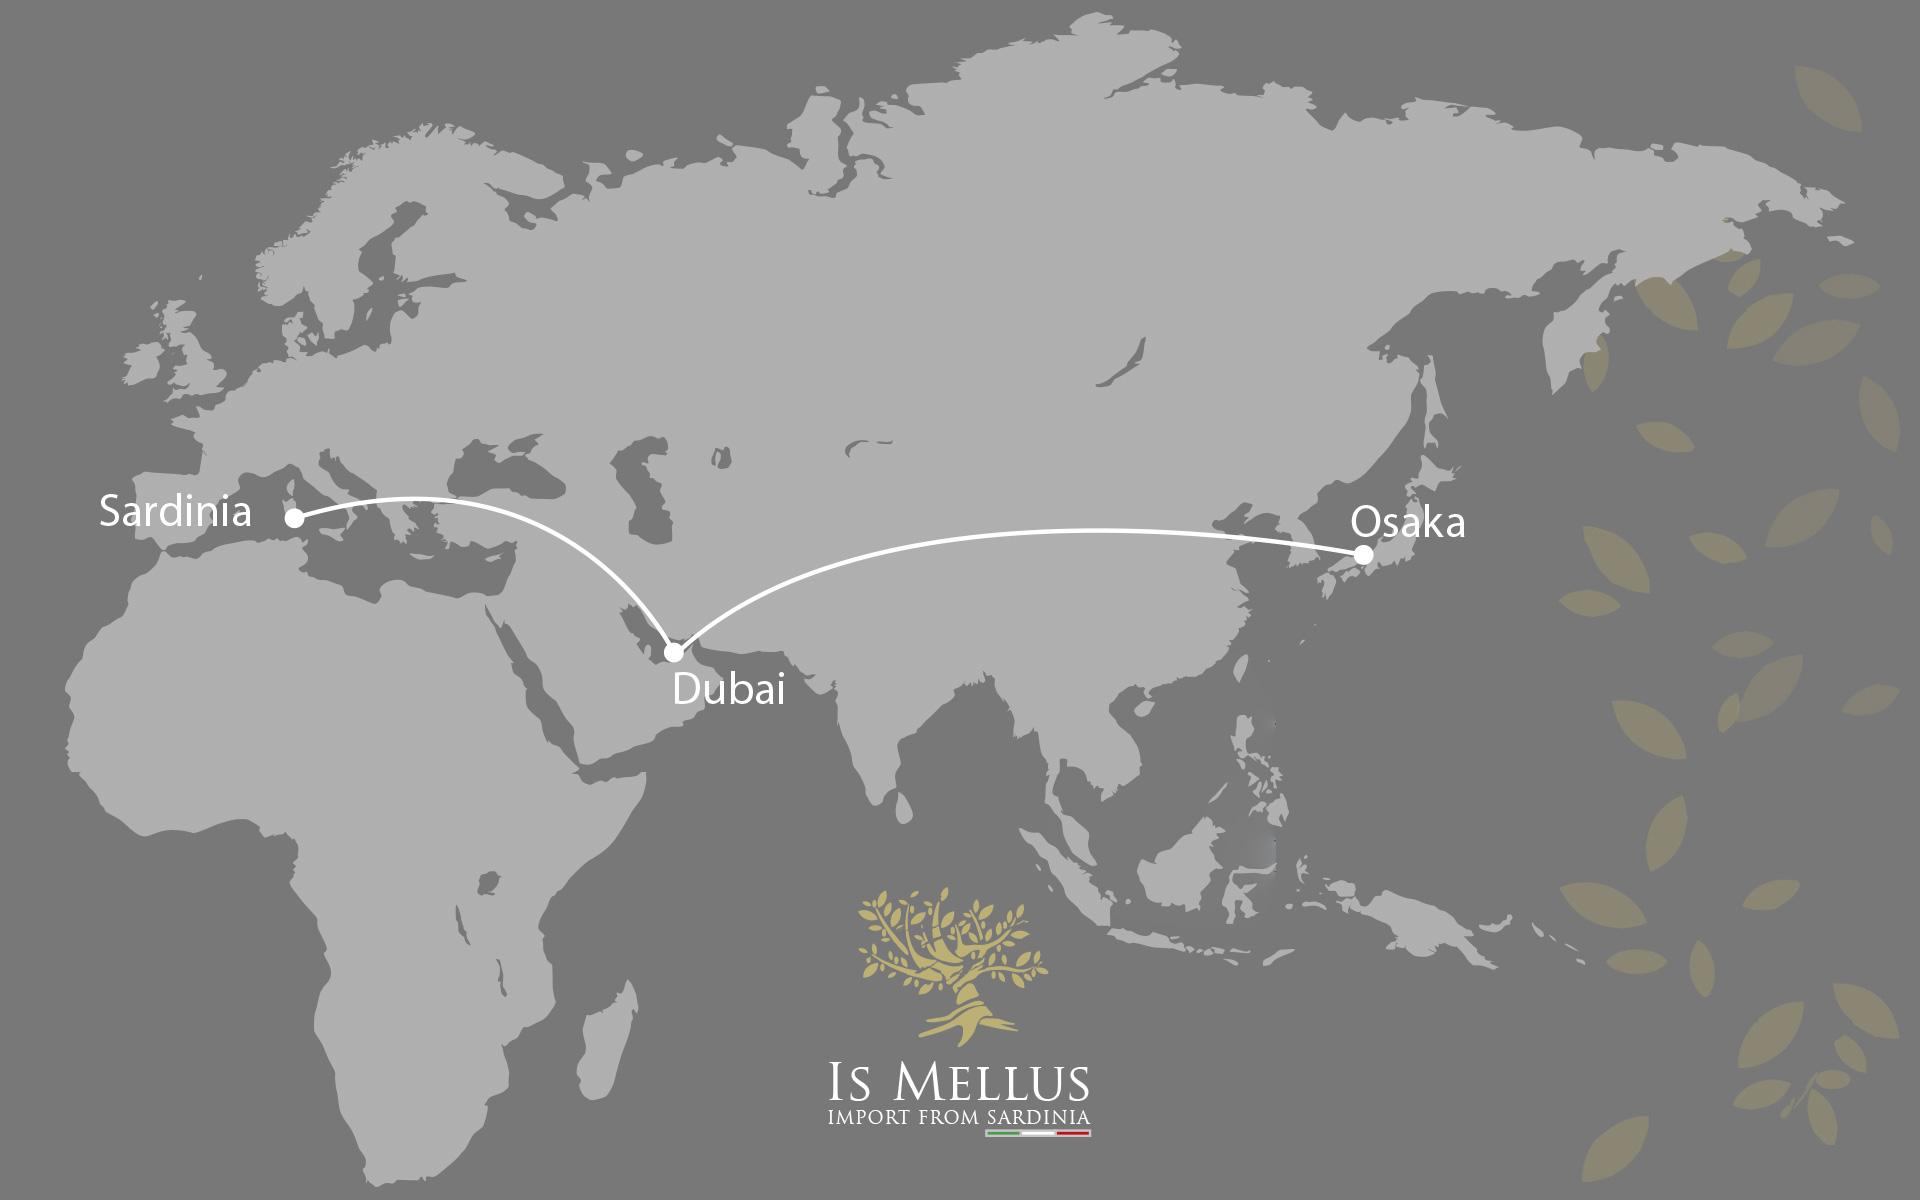 isMellus Map